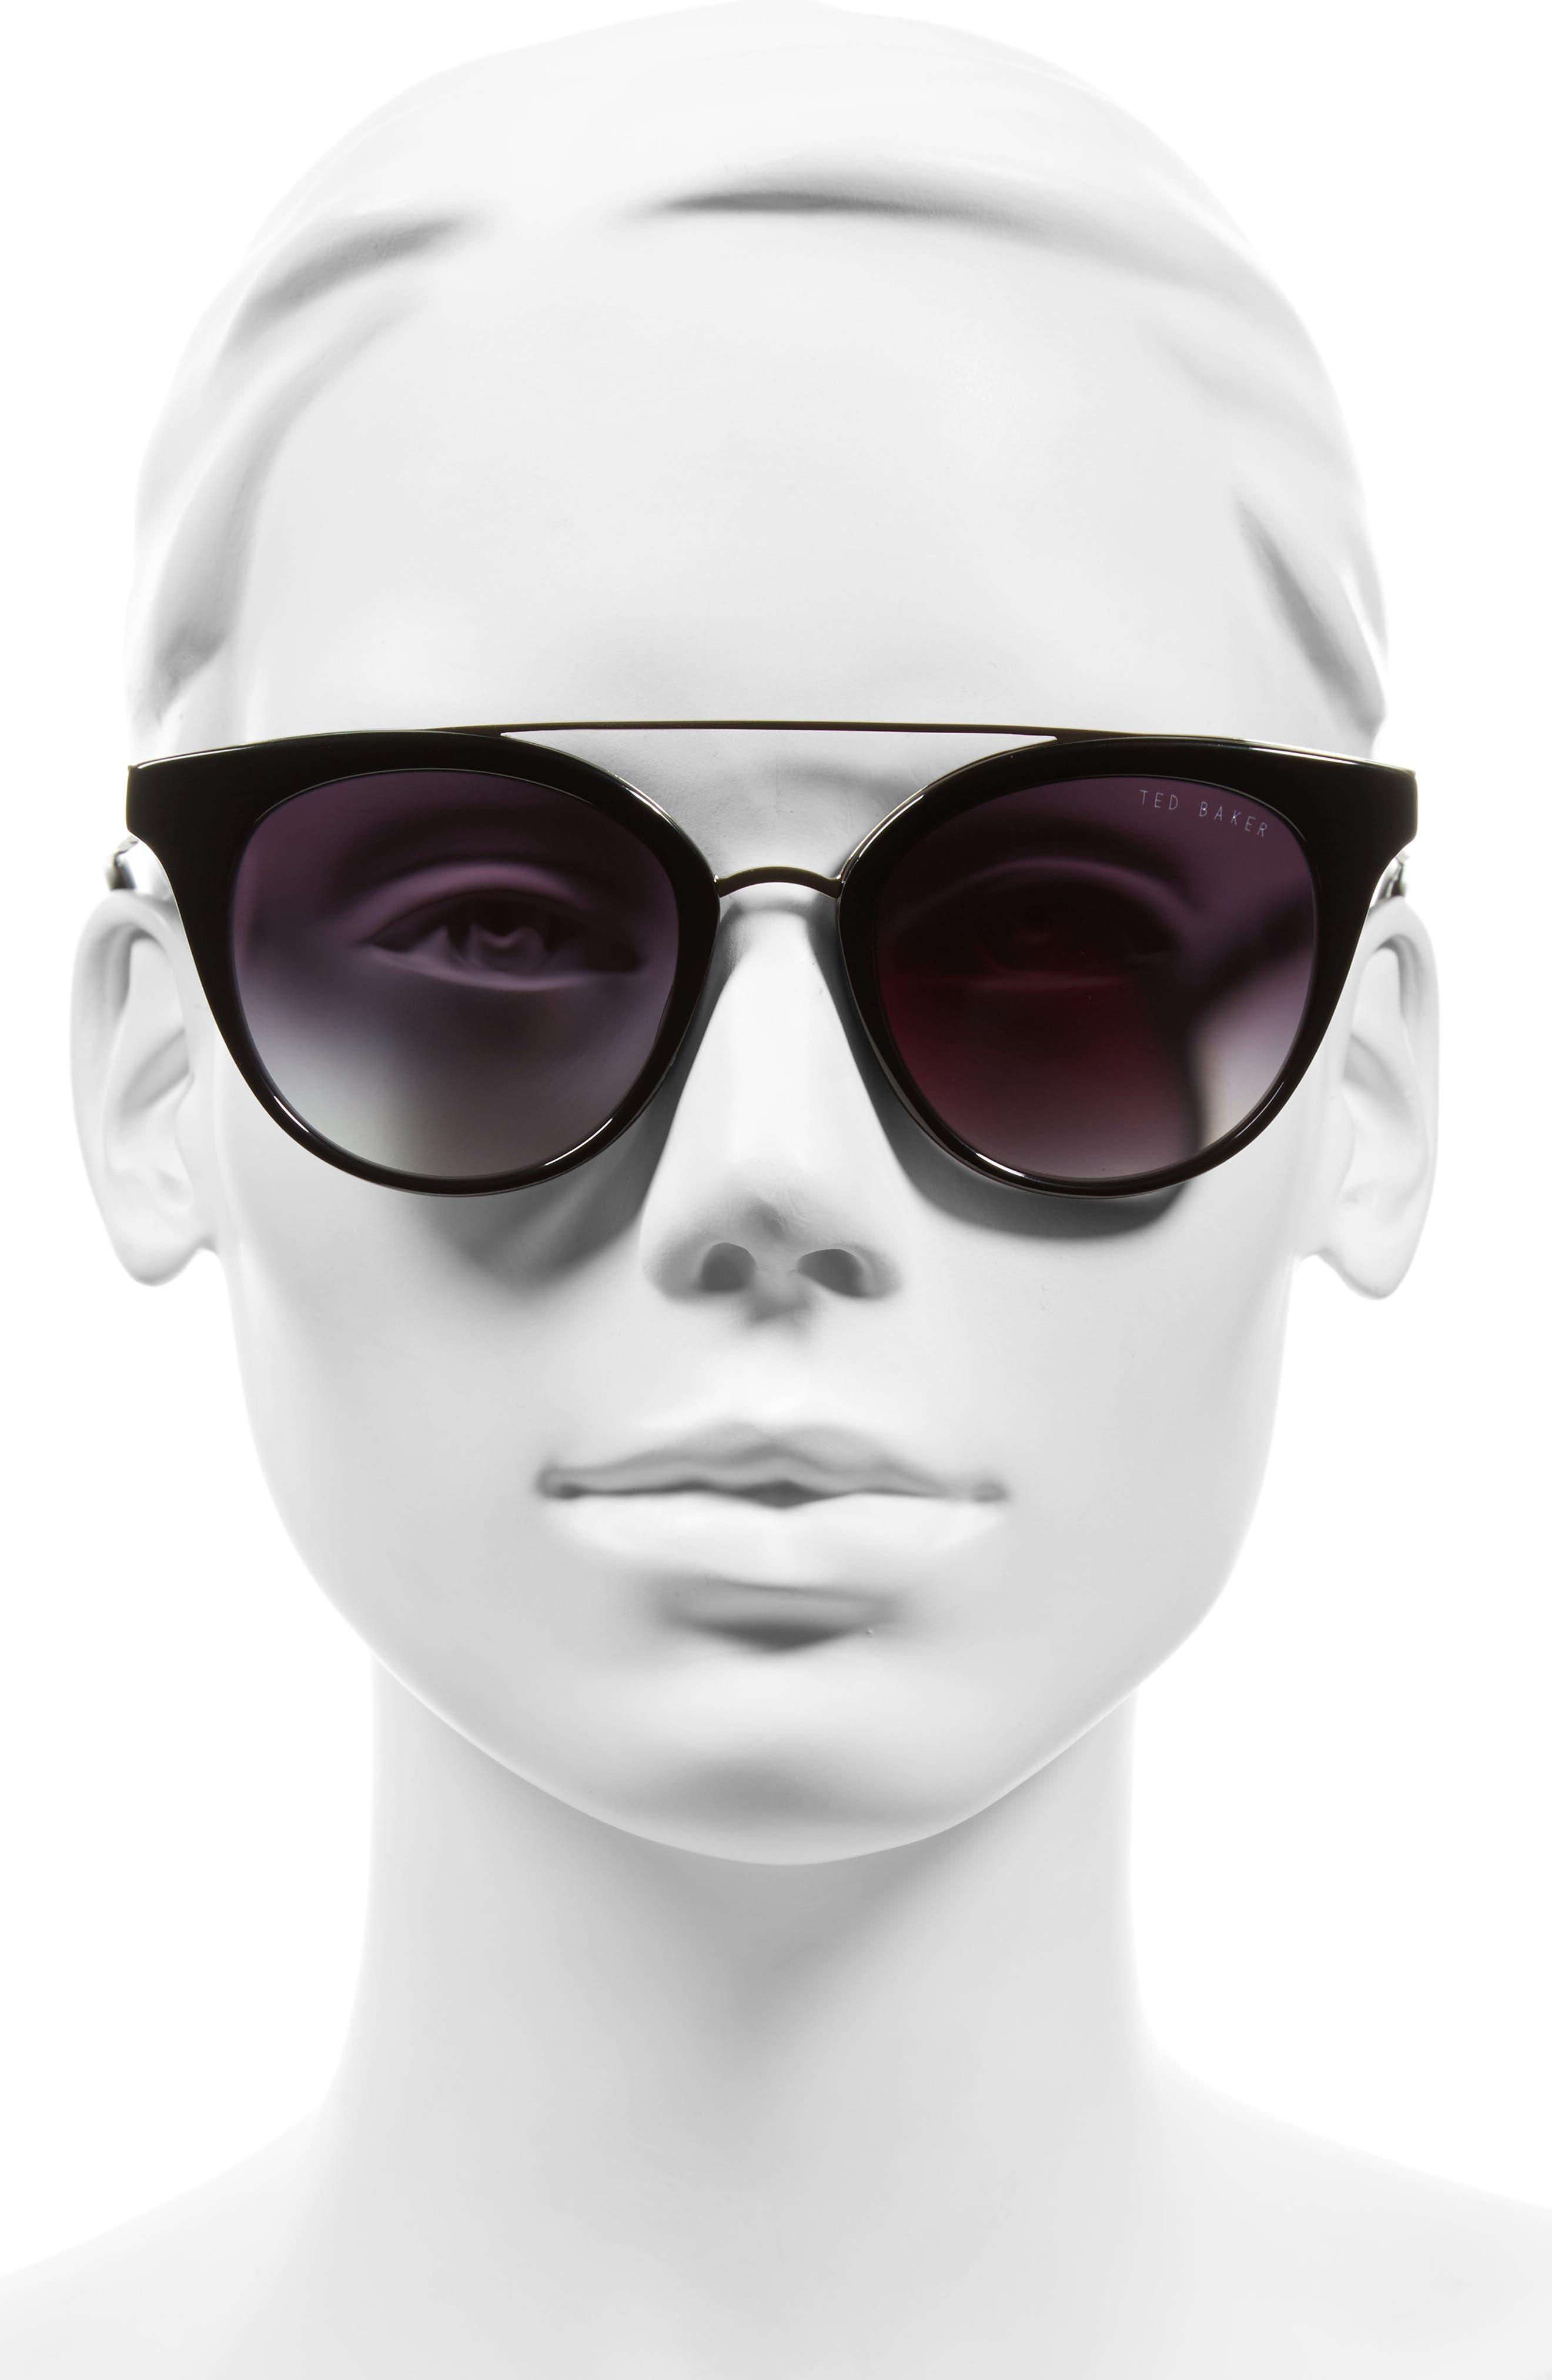 51mm Gradient Lens Round Retro Sunglasses,                             Main thumbnail 1, color,                             001